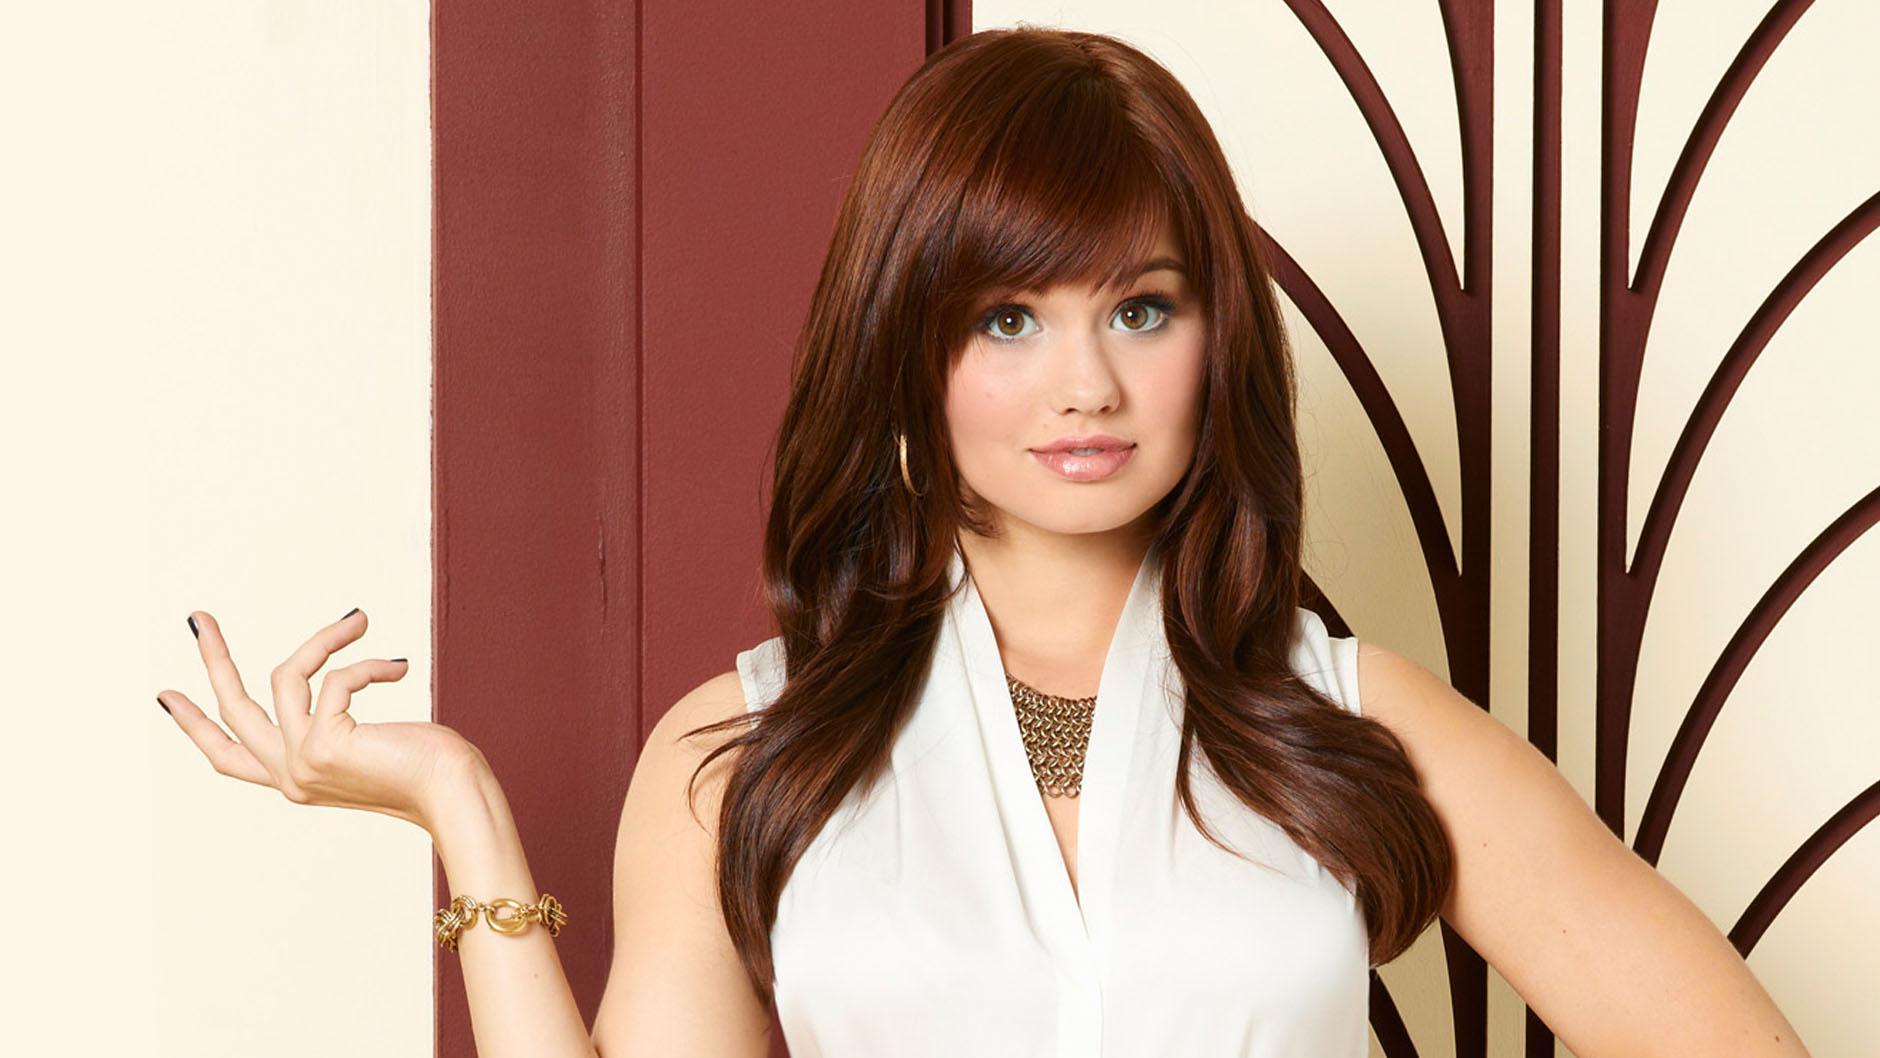 Ross On Disney Channel S Jessie Gave   Sexy Wallpapers   Rainpowcom 1880x1058